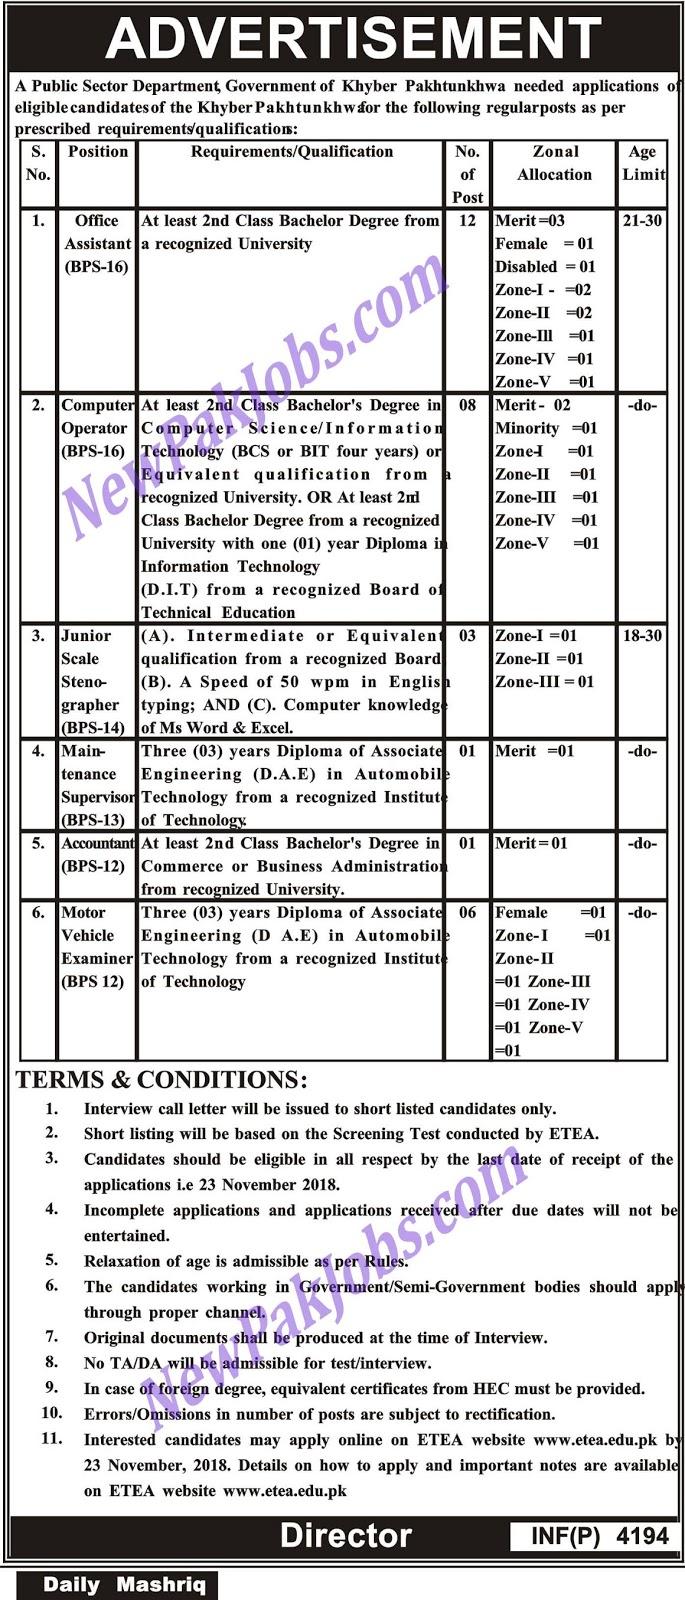 etea.edu.pk-jobs-november-2018